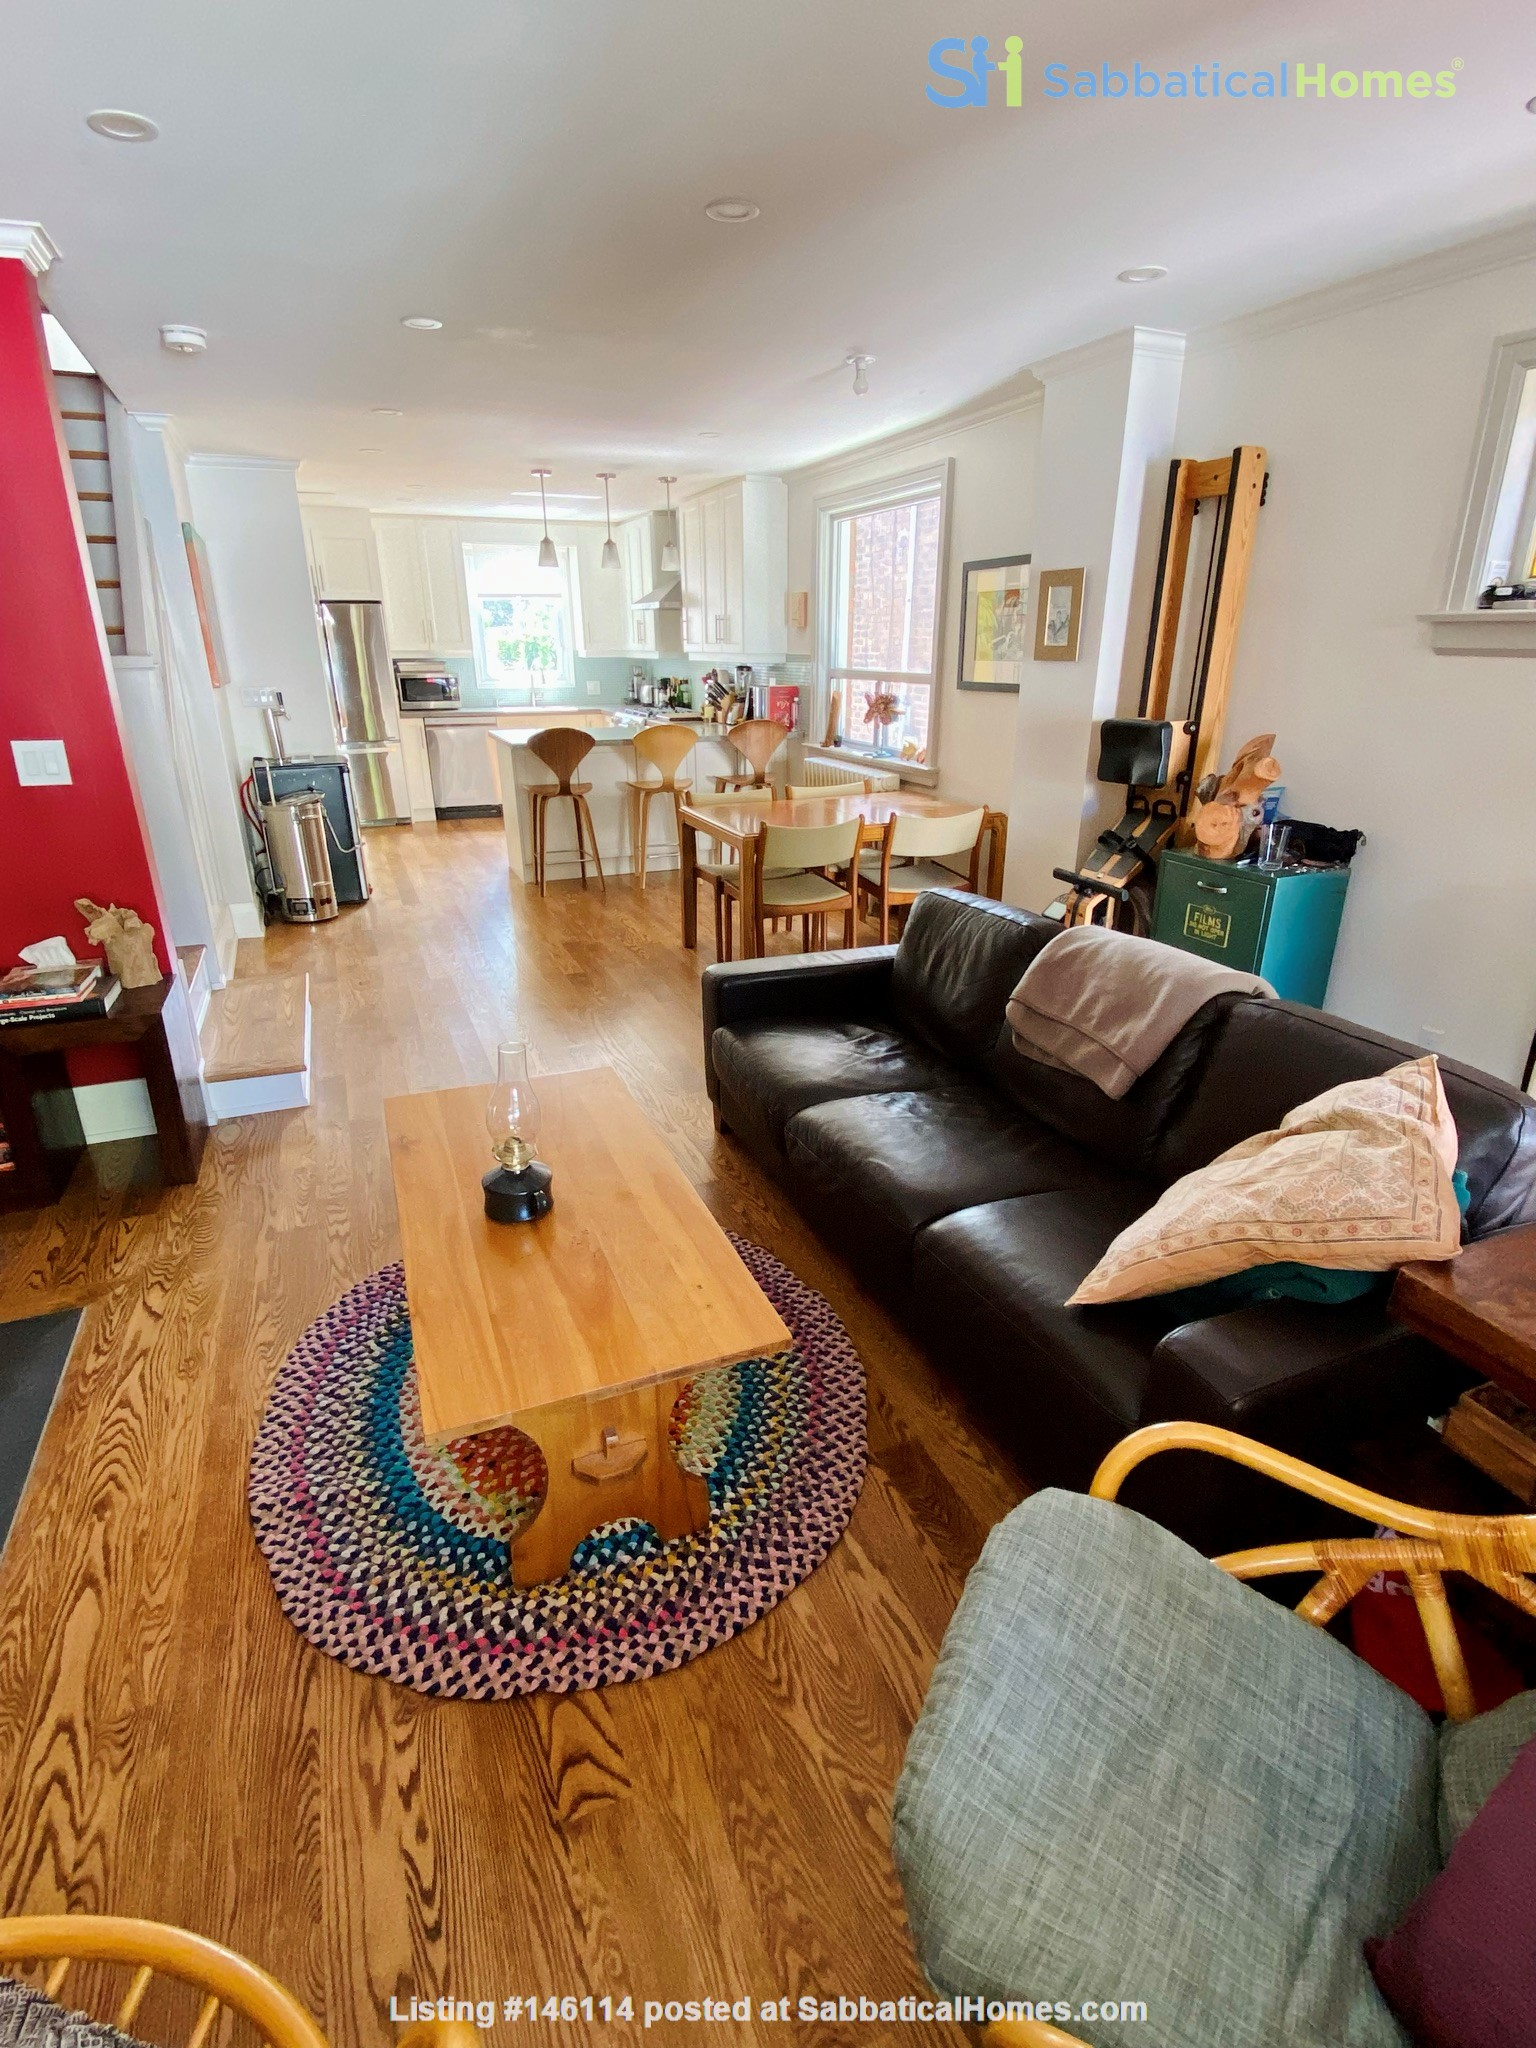 Charming 3 bdrm garden home for rent near The Danforth (w/backyard&parking) Home Rental in Toronto 2